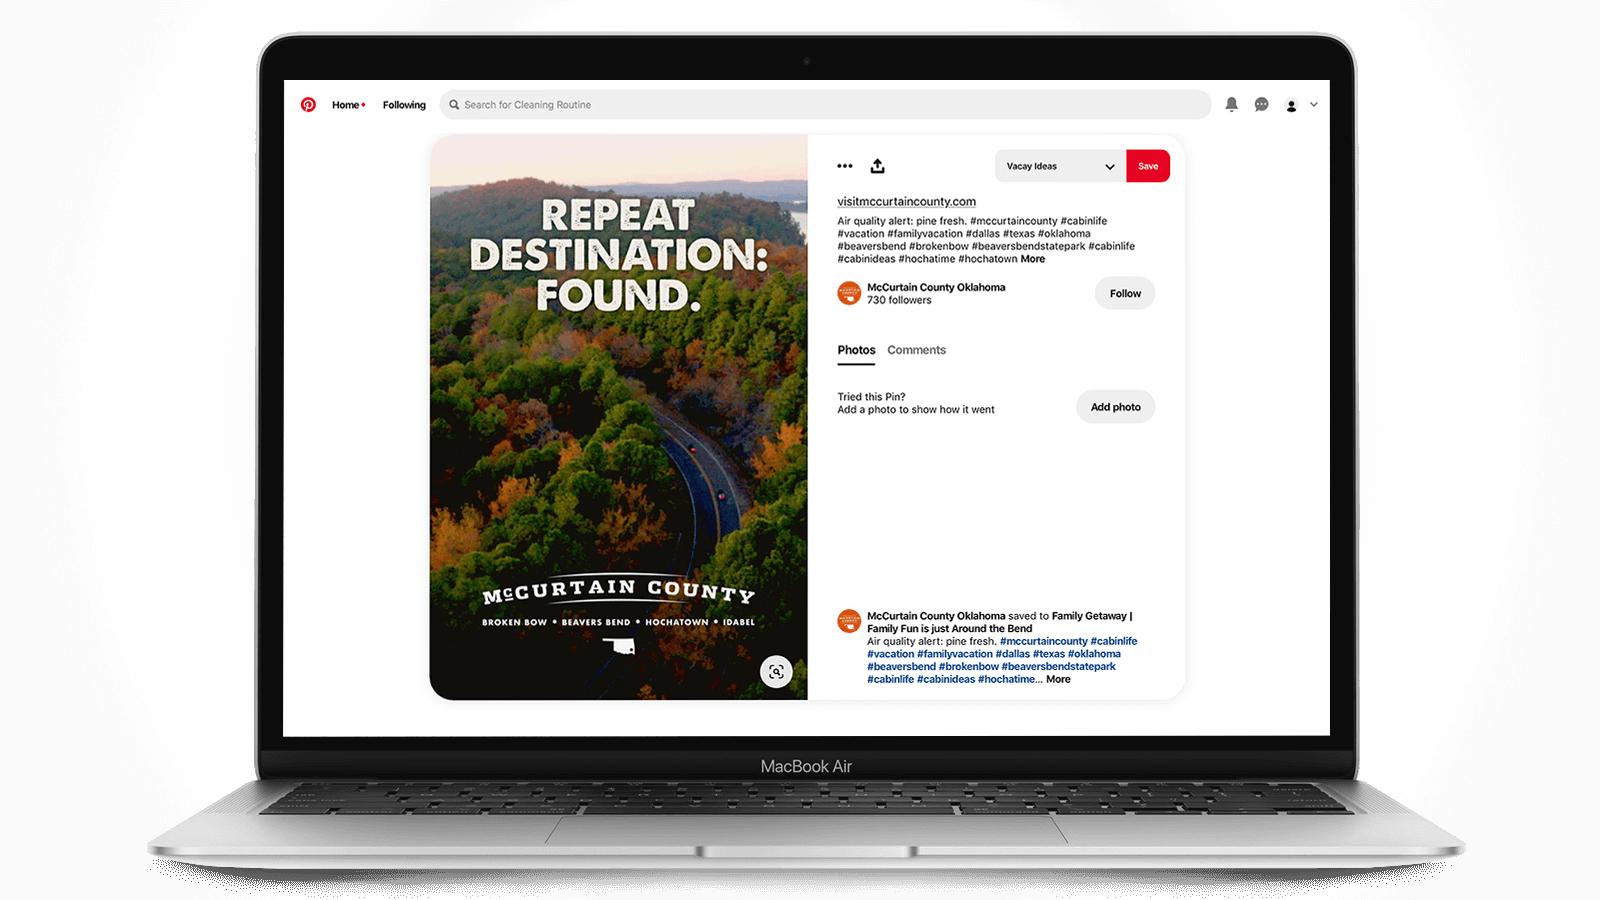 Tourism marketing on Pinterest